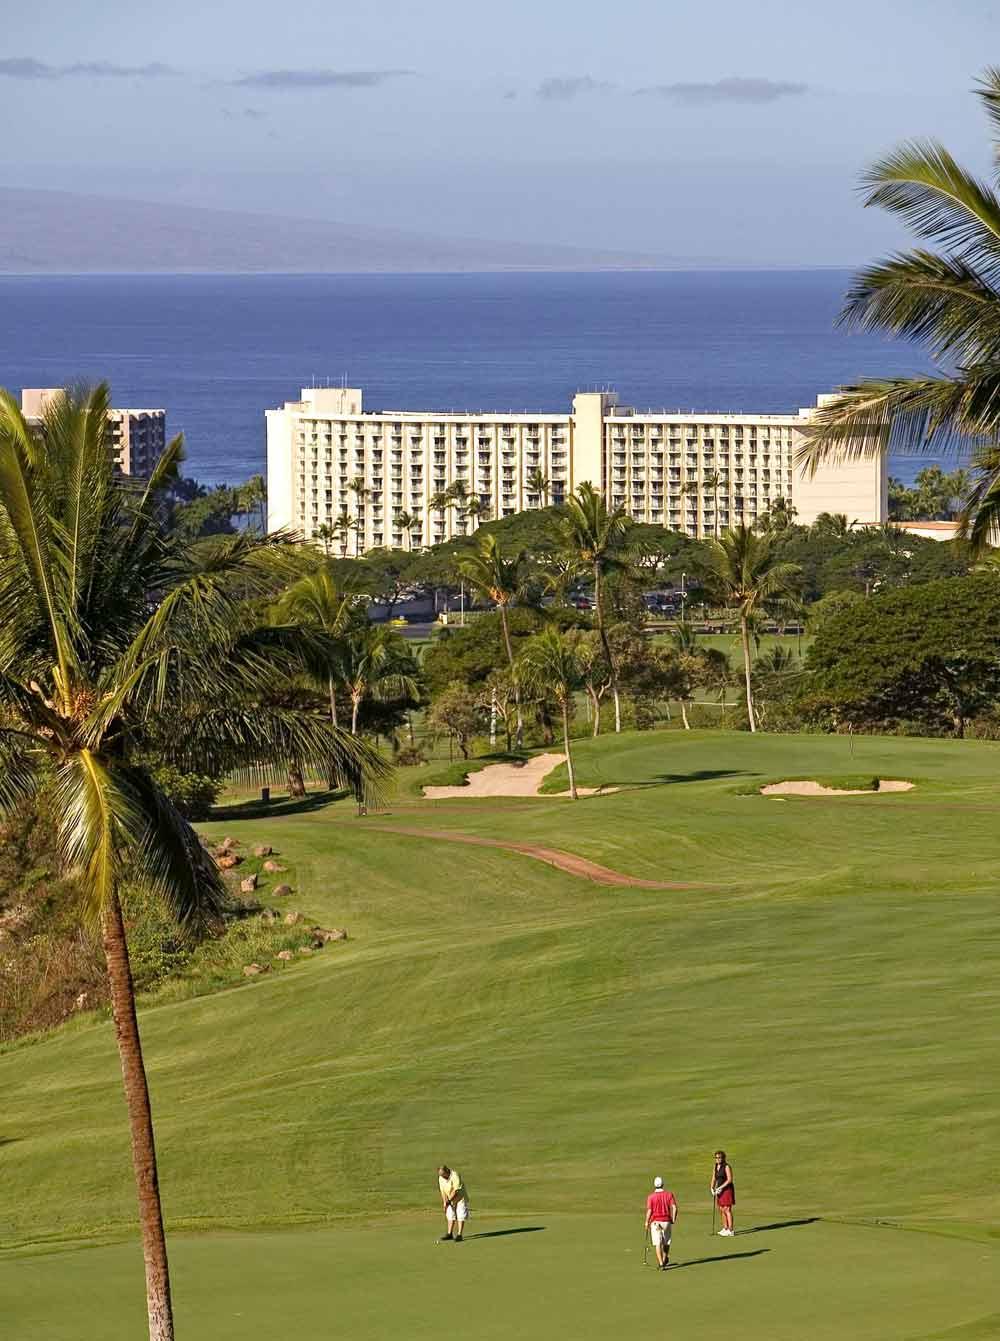 Signature Golf Course at Westin Maui Resort